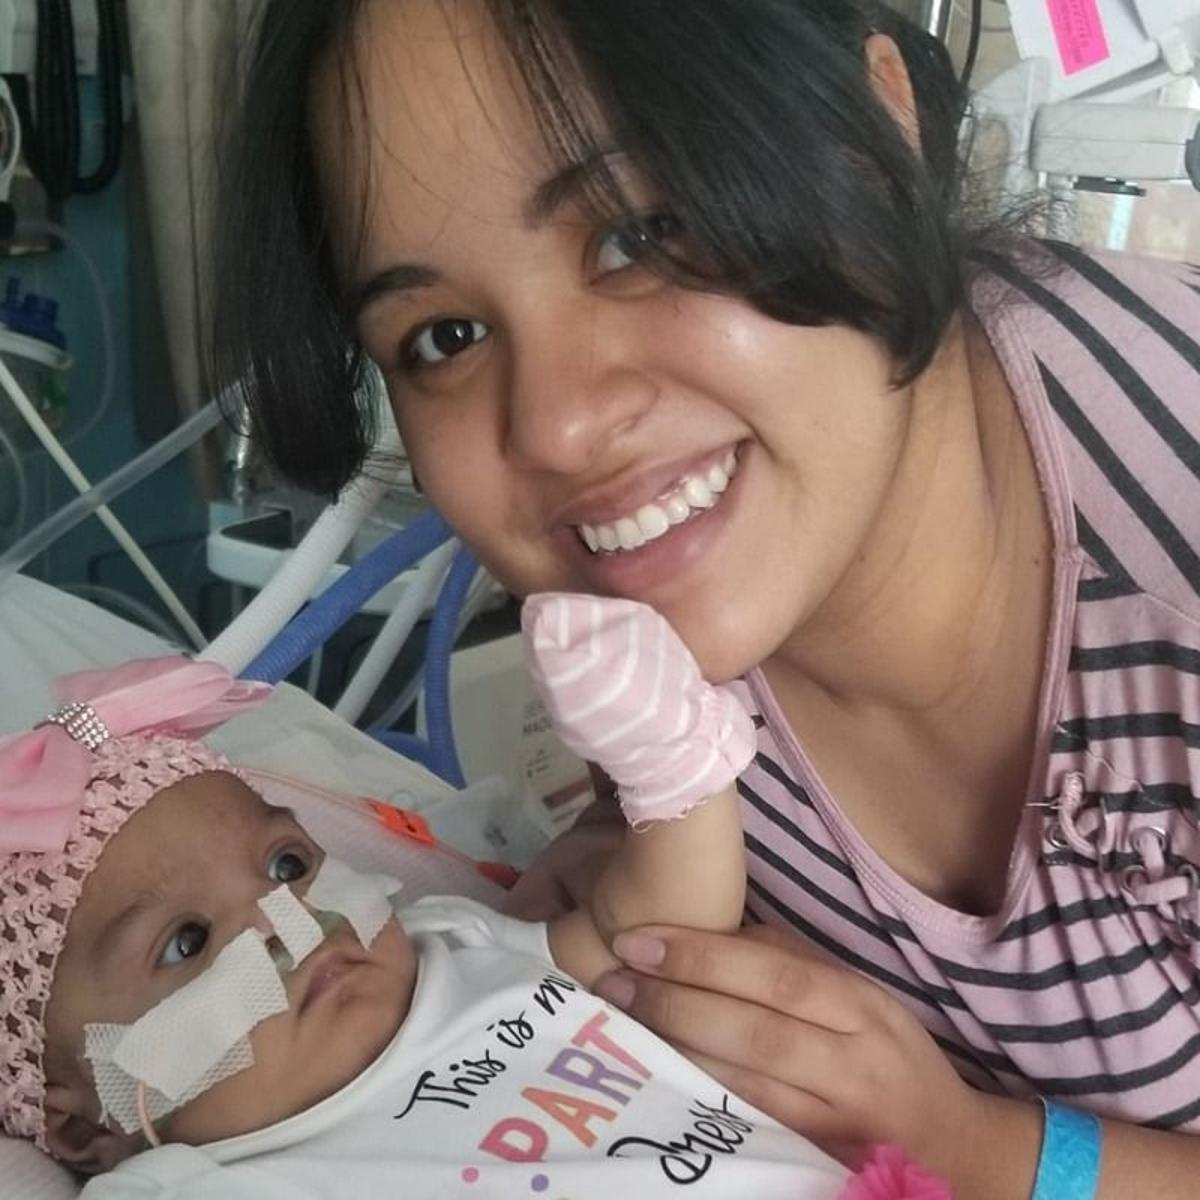 Bebé de origen puertorriqueño pierde la vida por coronavirus ...